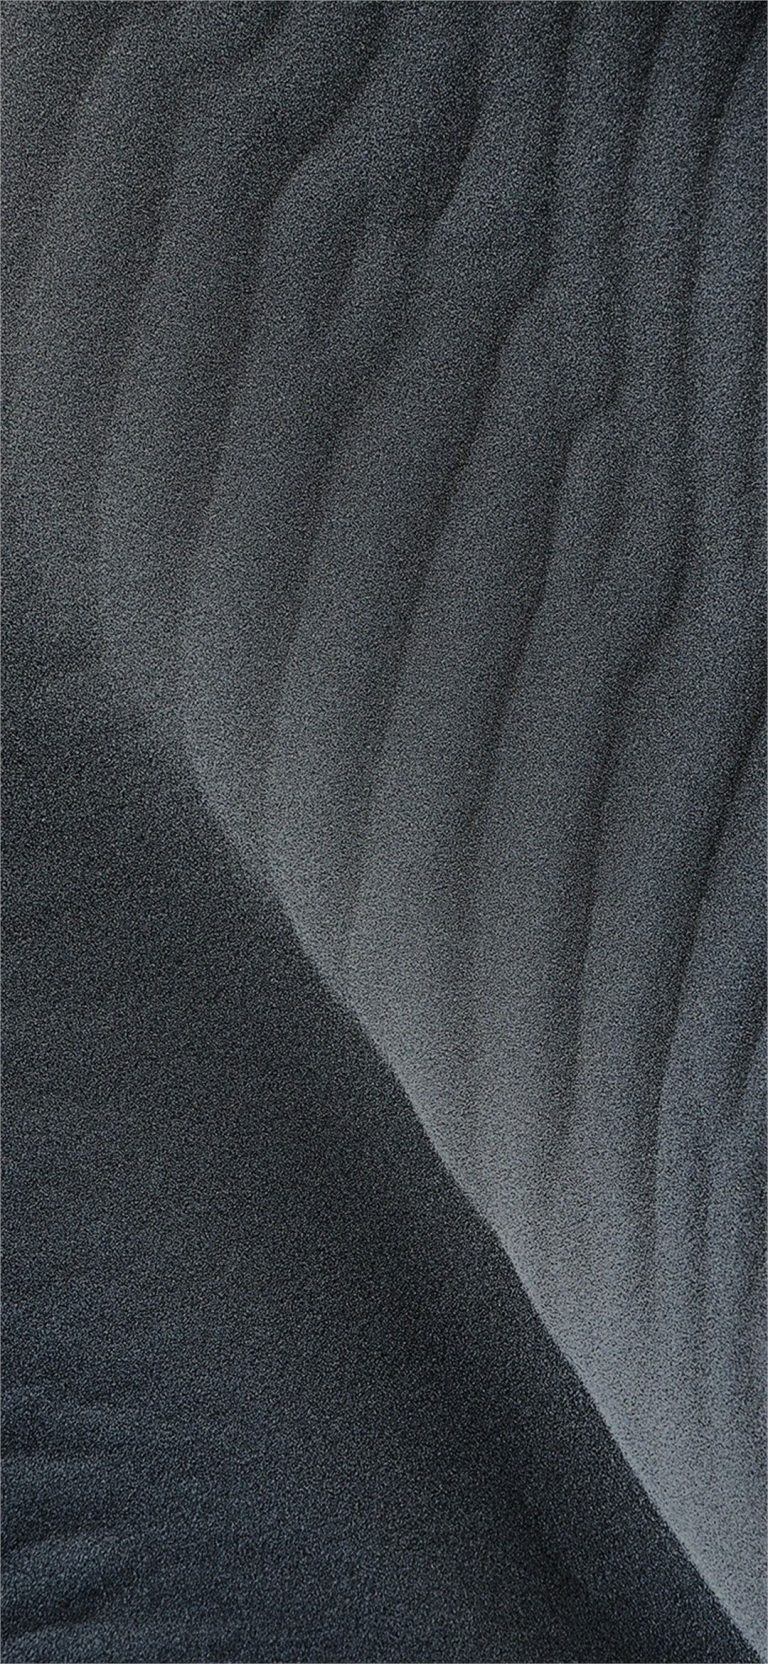 Color OS 6 Stock Wallpaper 14 1080x2340 768x1664